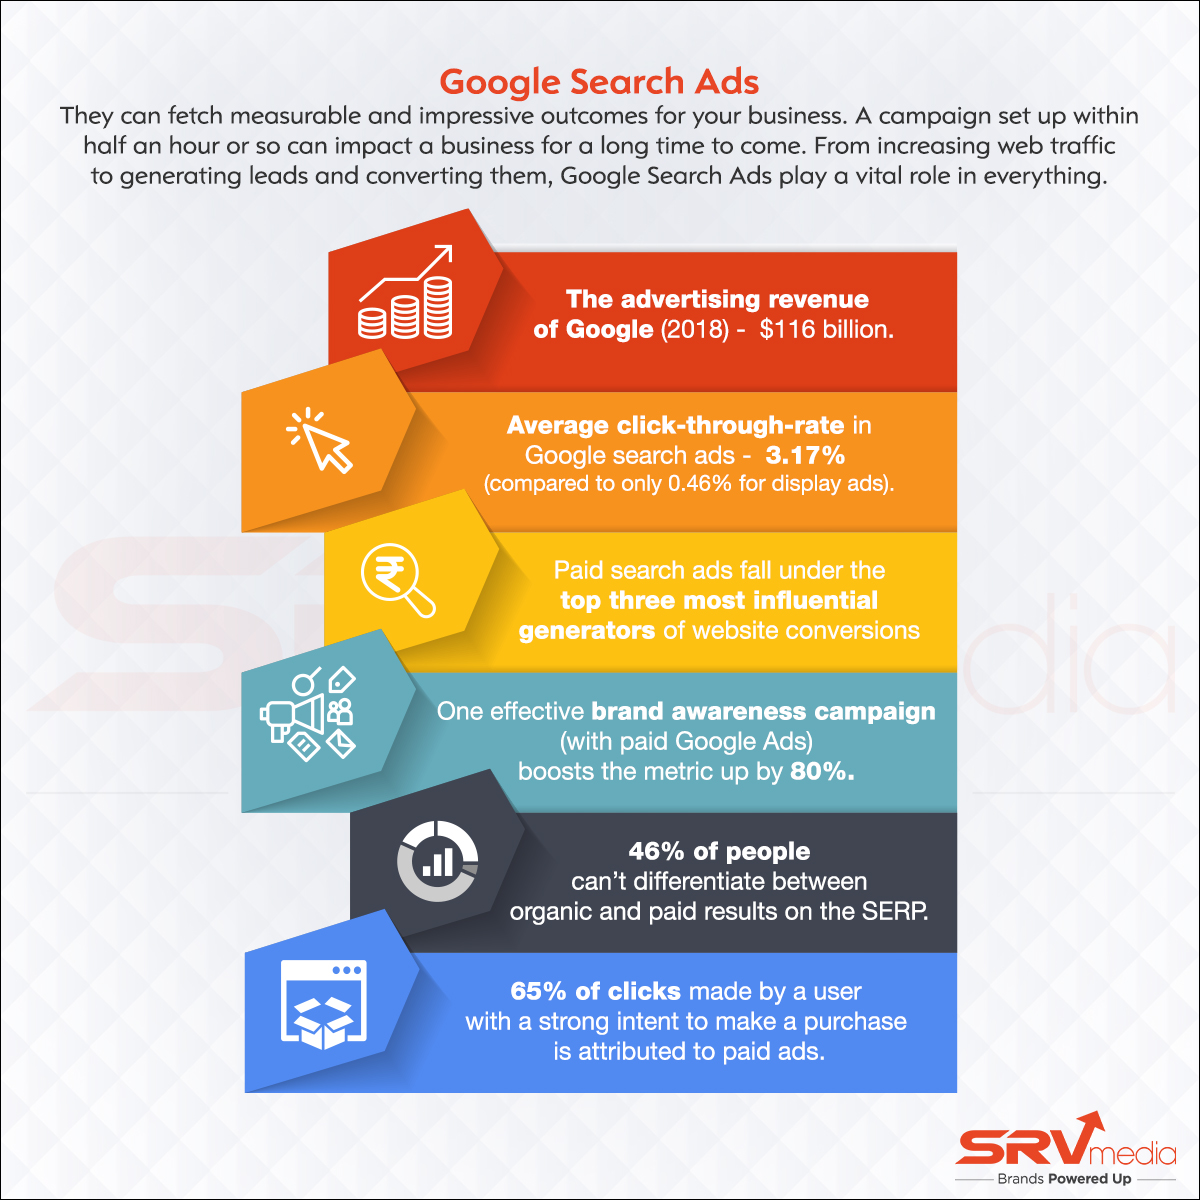 Google Search Ads Statisticss